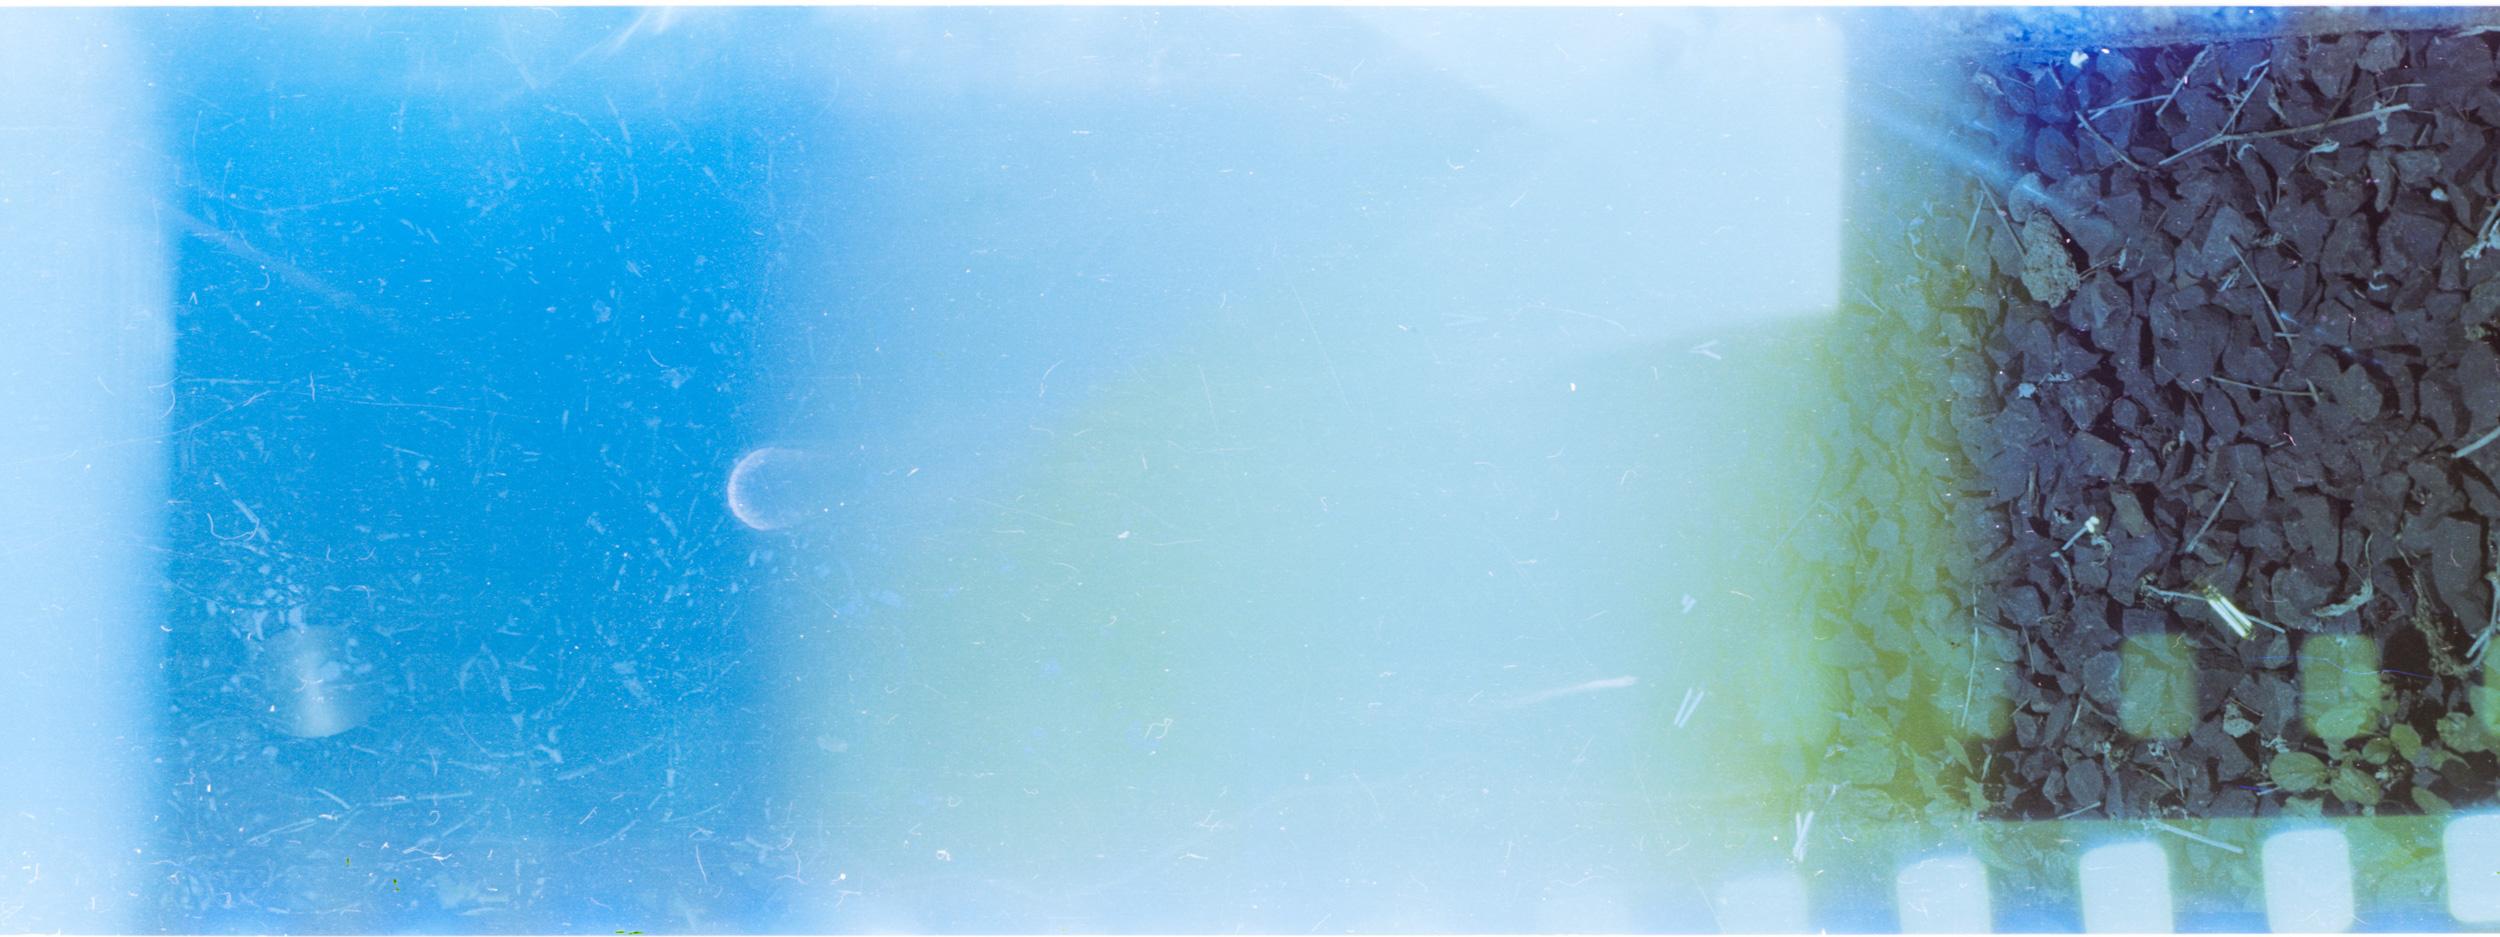 Seleção Deriva - 36.jpg